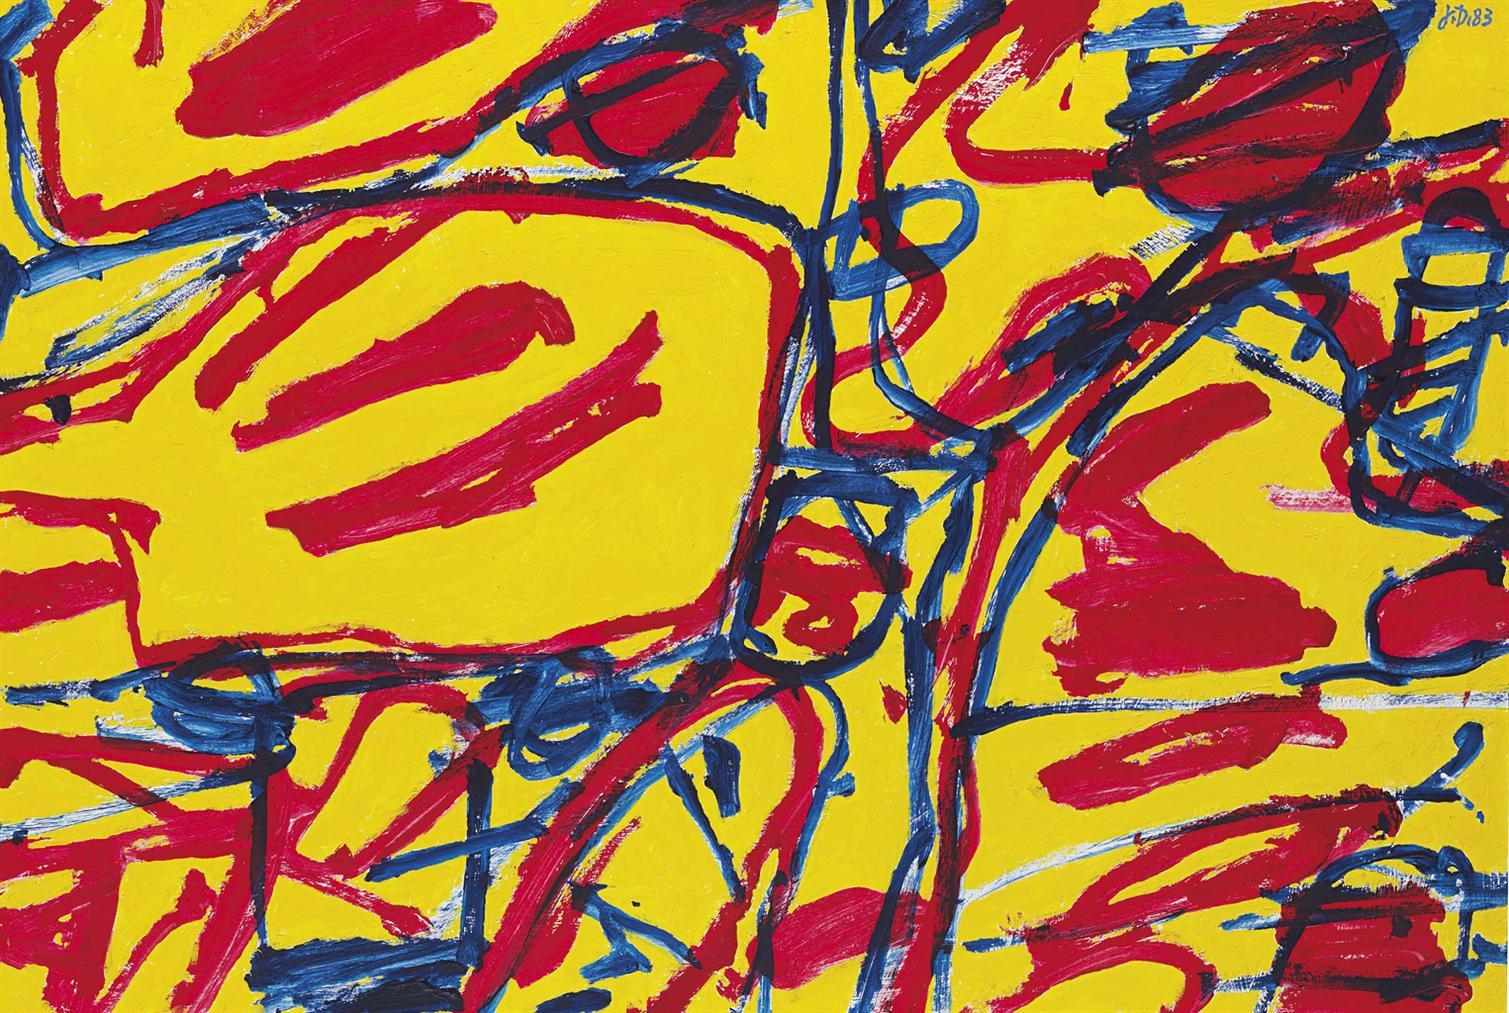 Jean Dubuffet-Mire G 33 (Kowloon)-1983